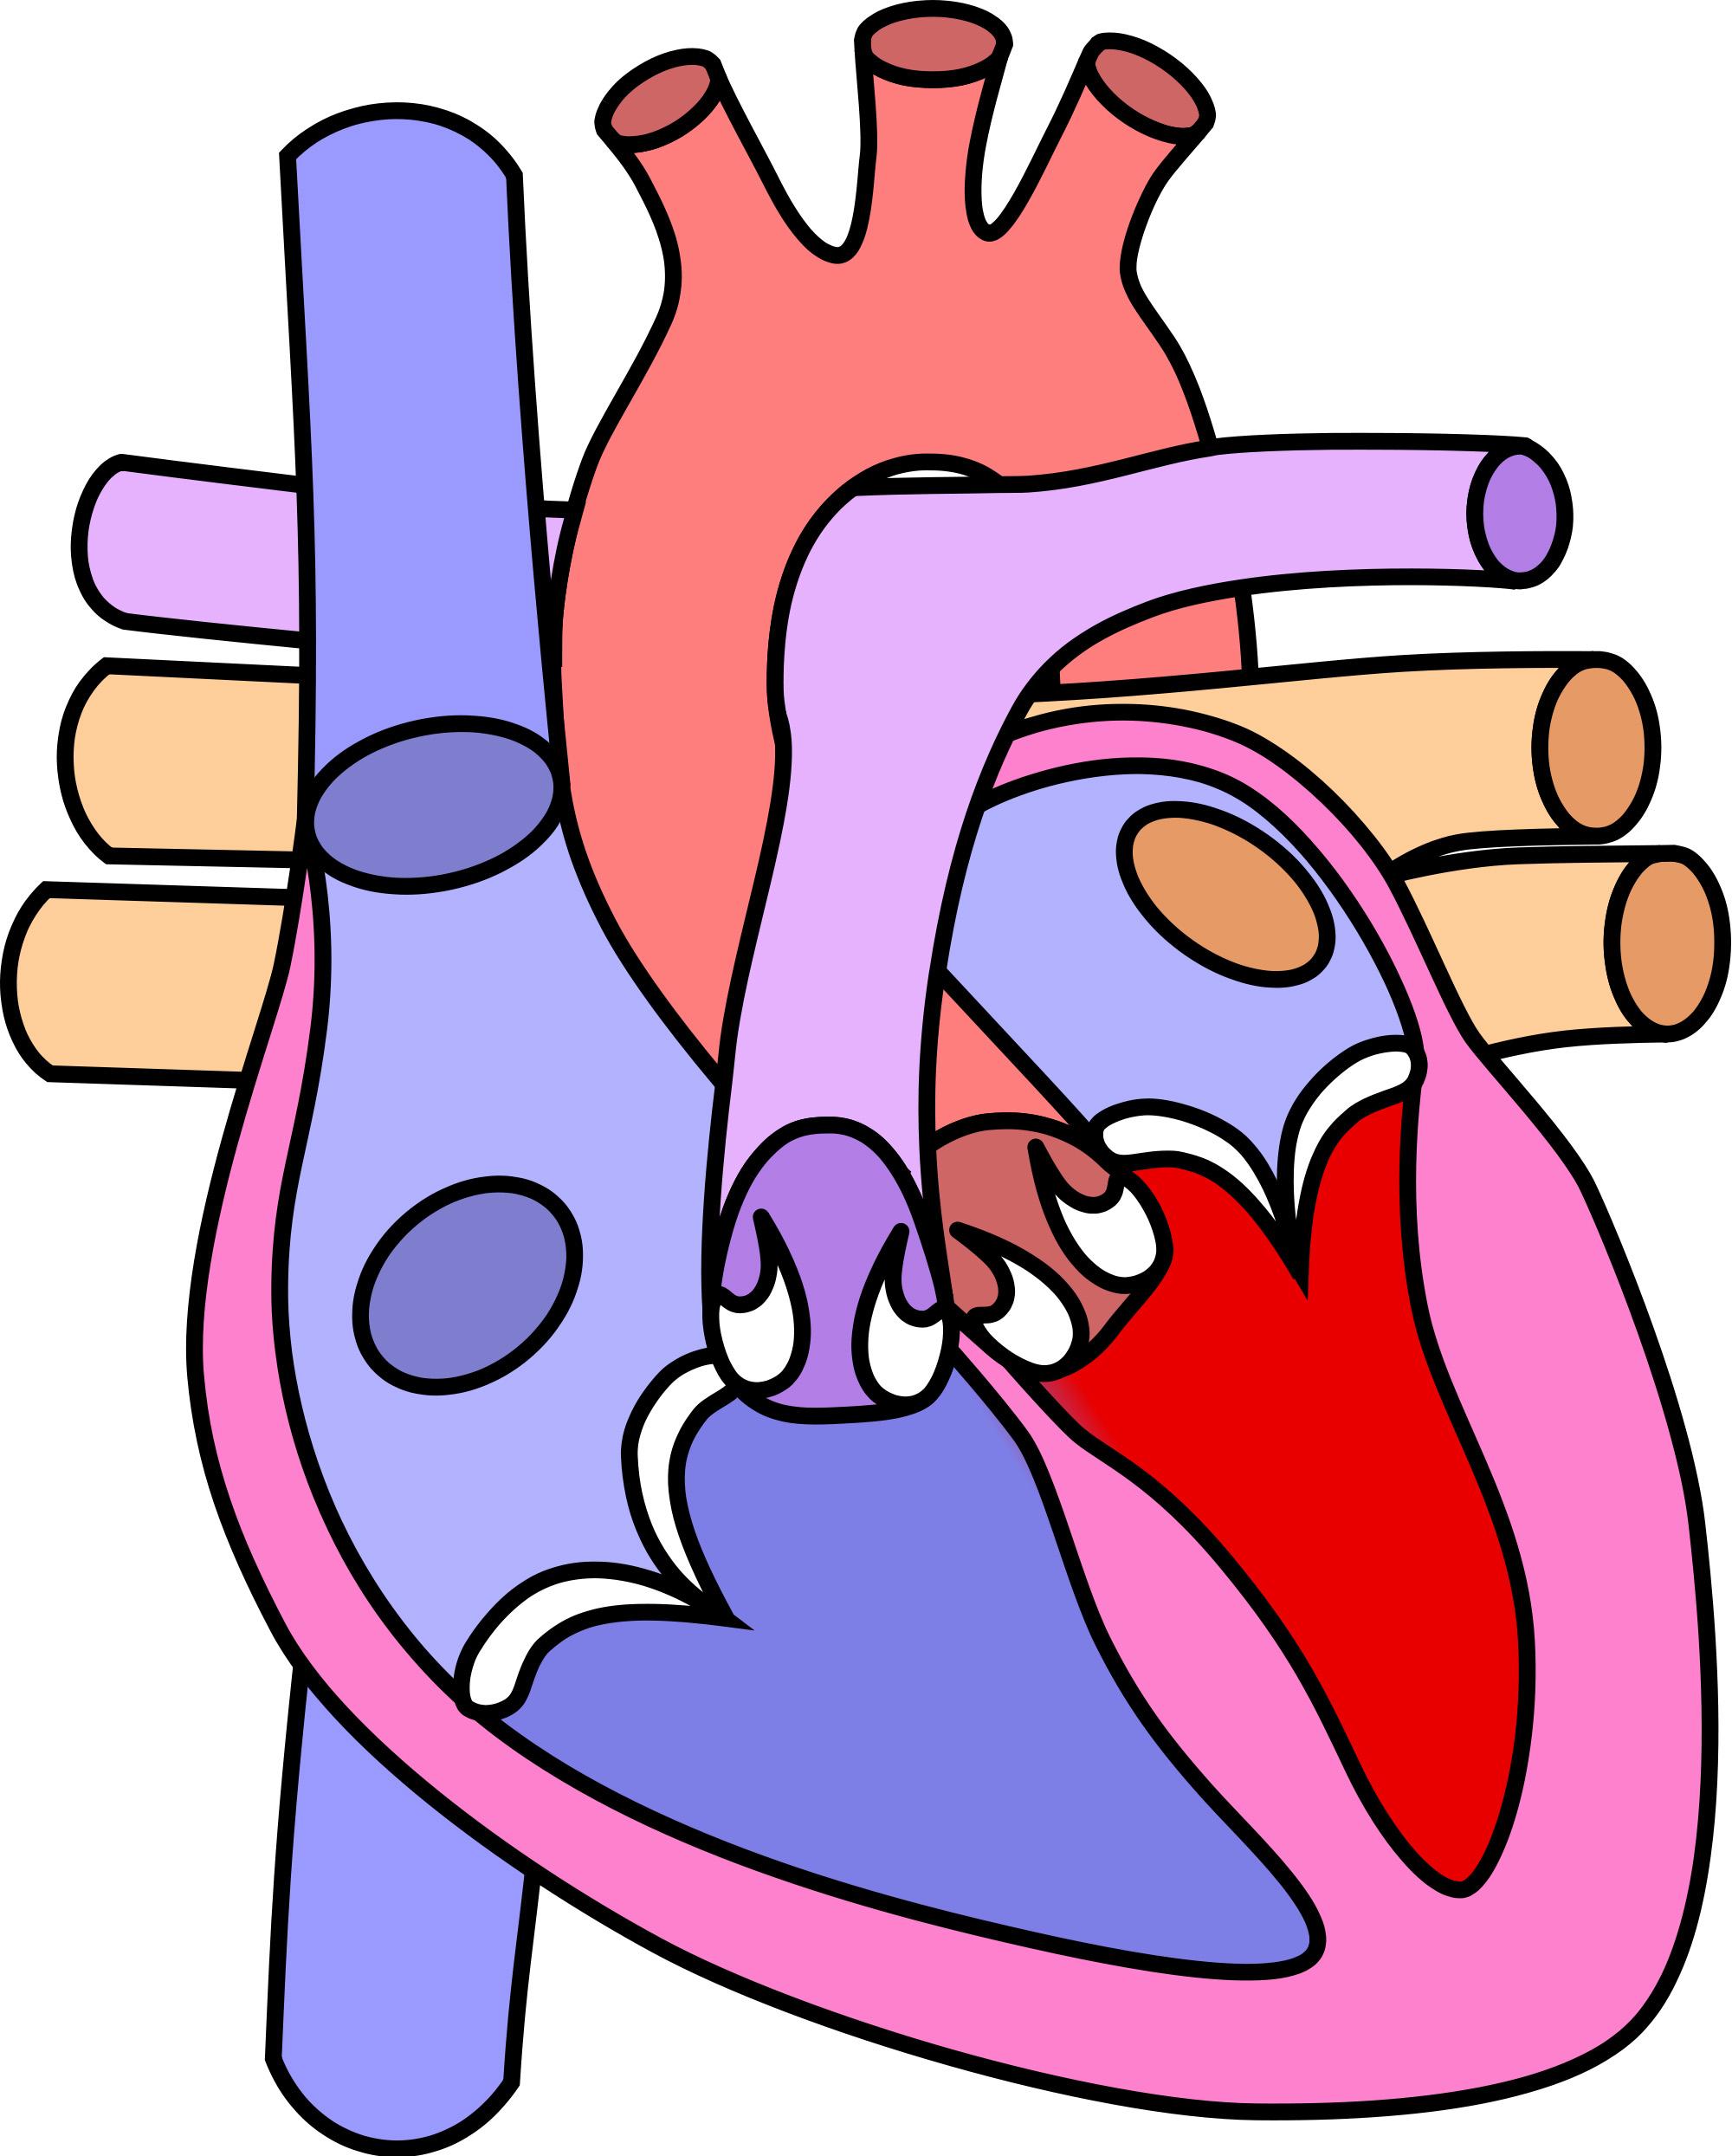 corazon normal